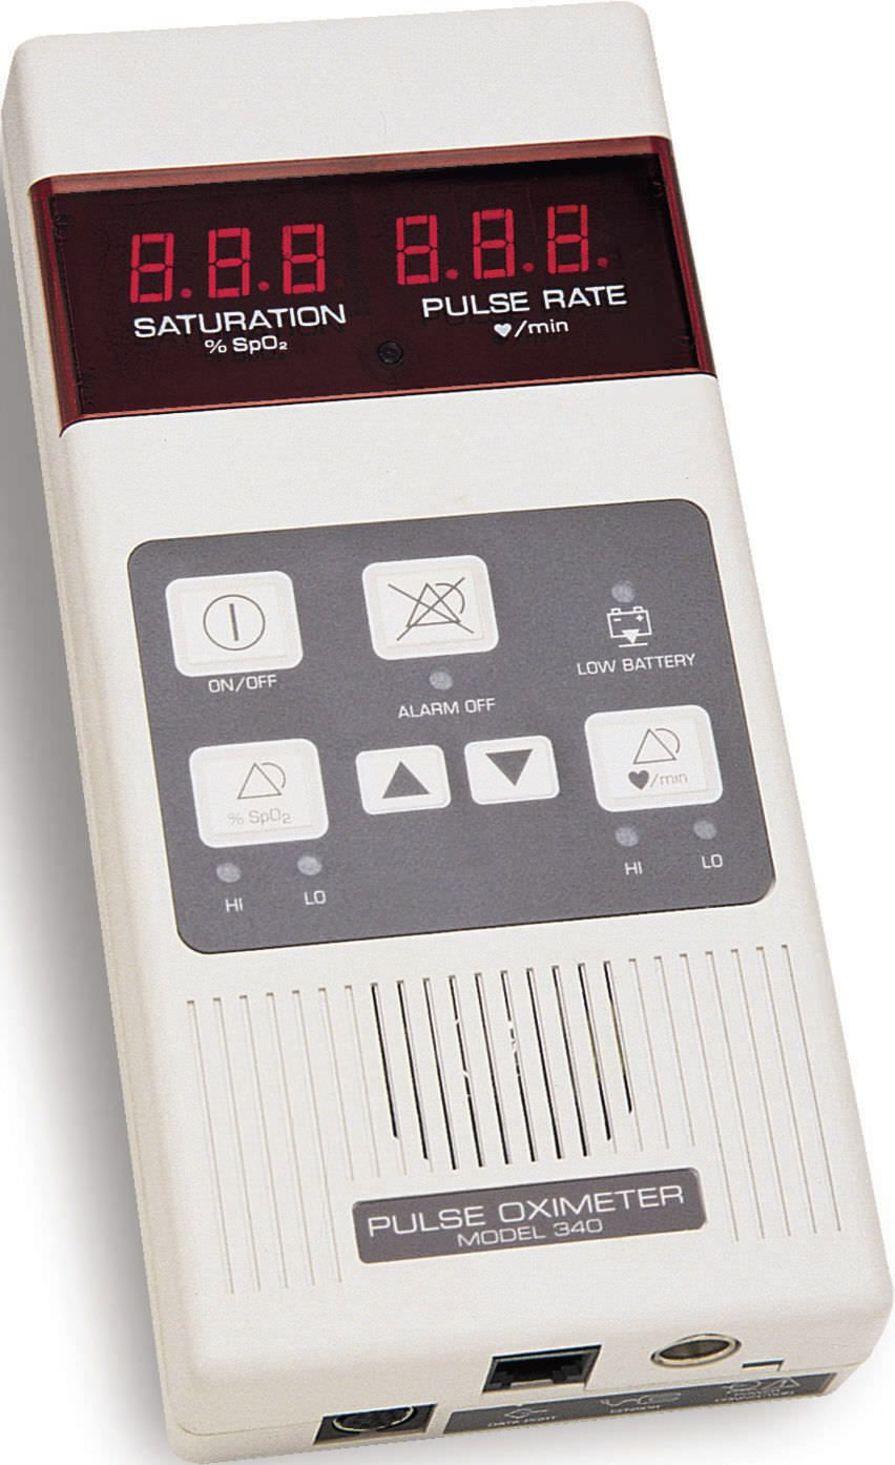 Handheld pulse oximeter / with separate sensor 0-100 % SpO2 | MODEL 340 Mediaid Inc.